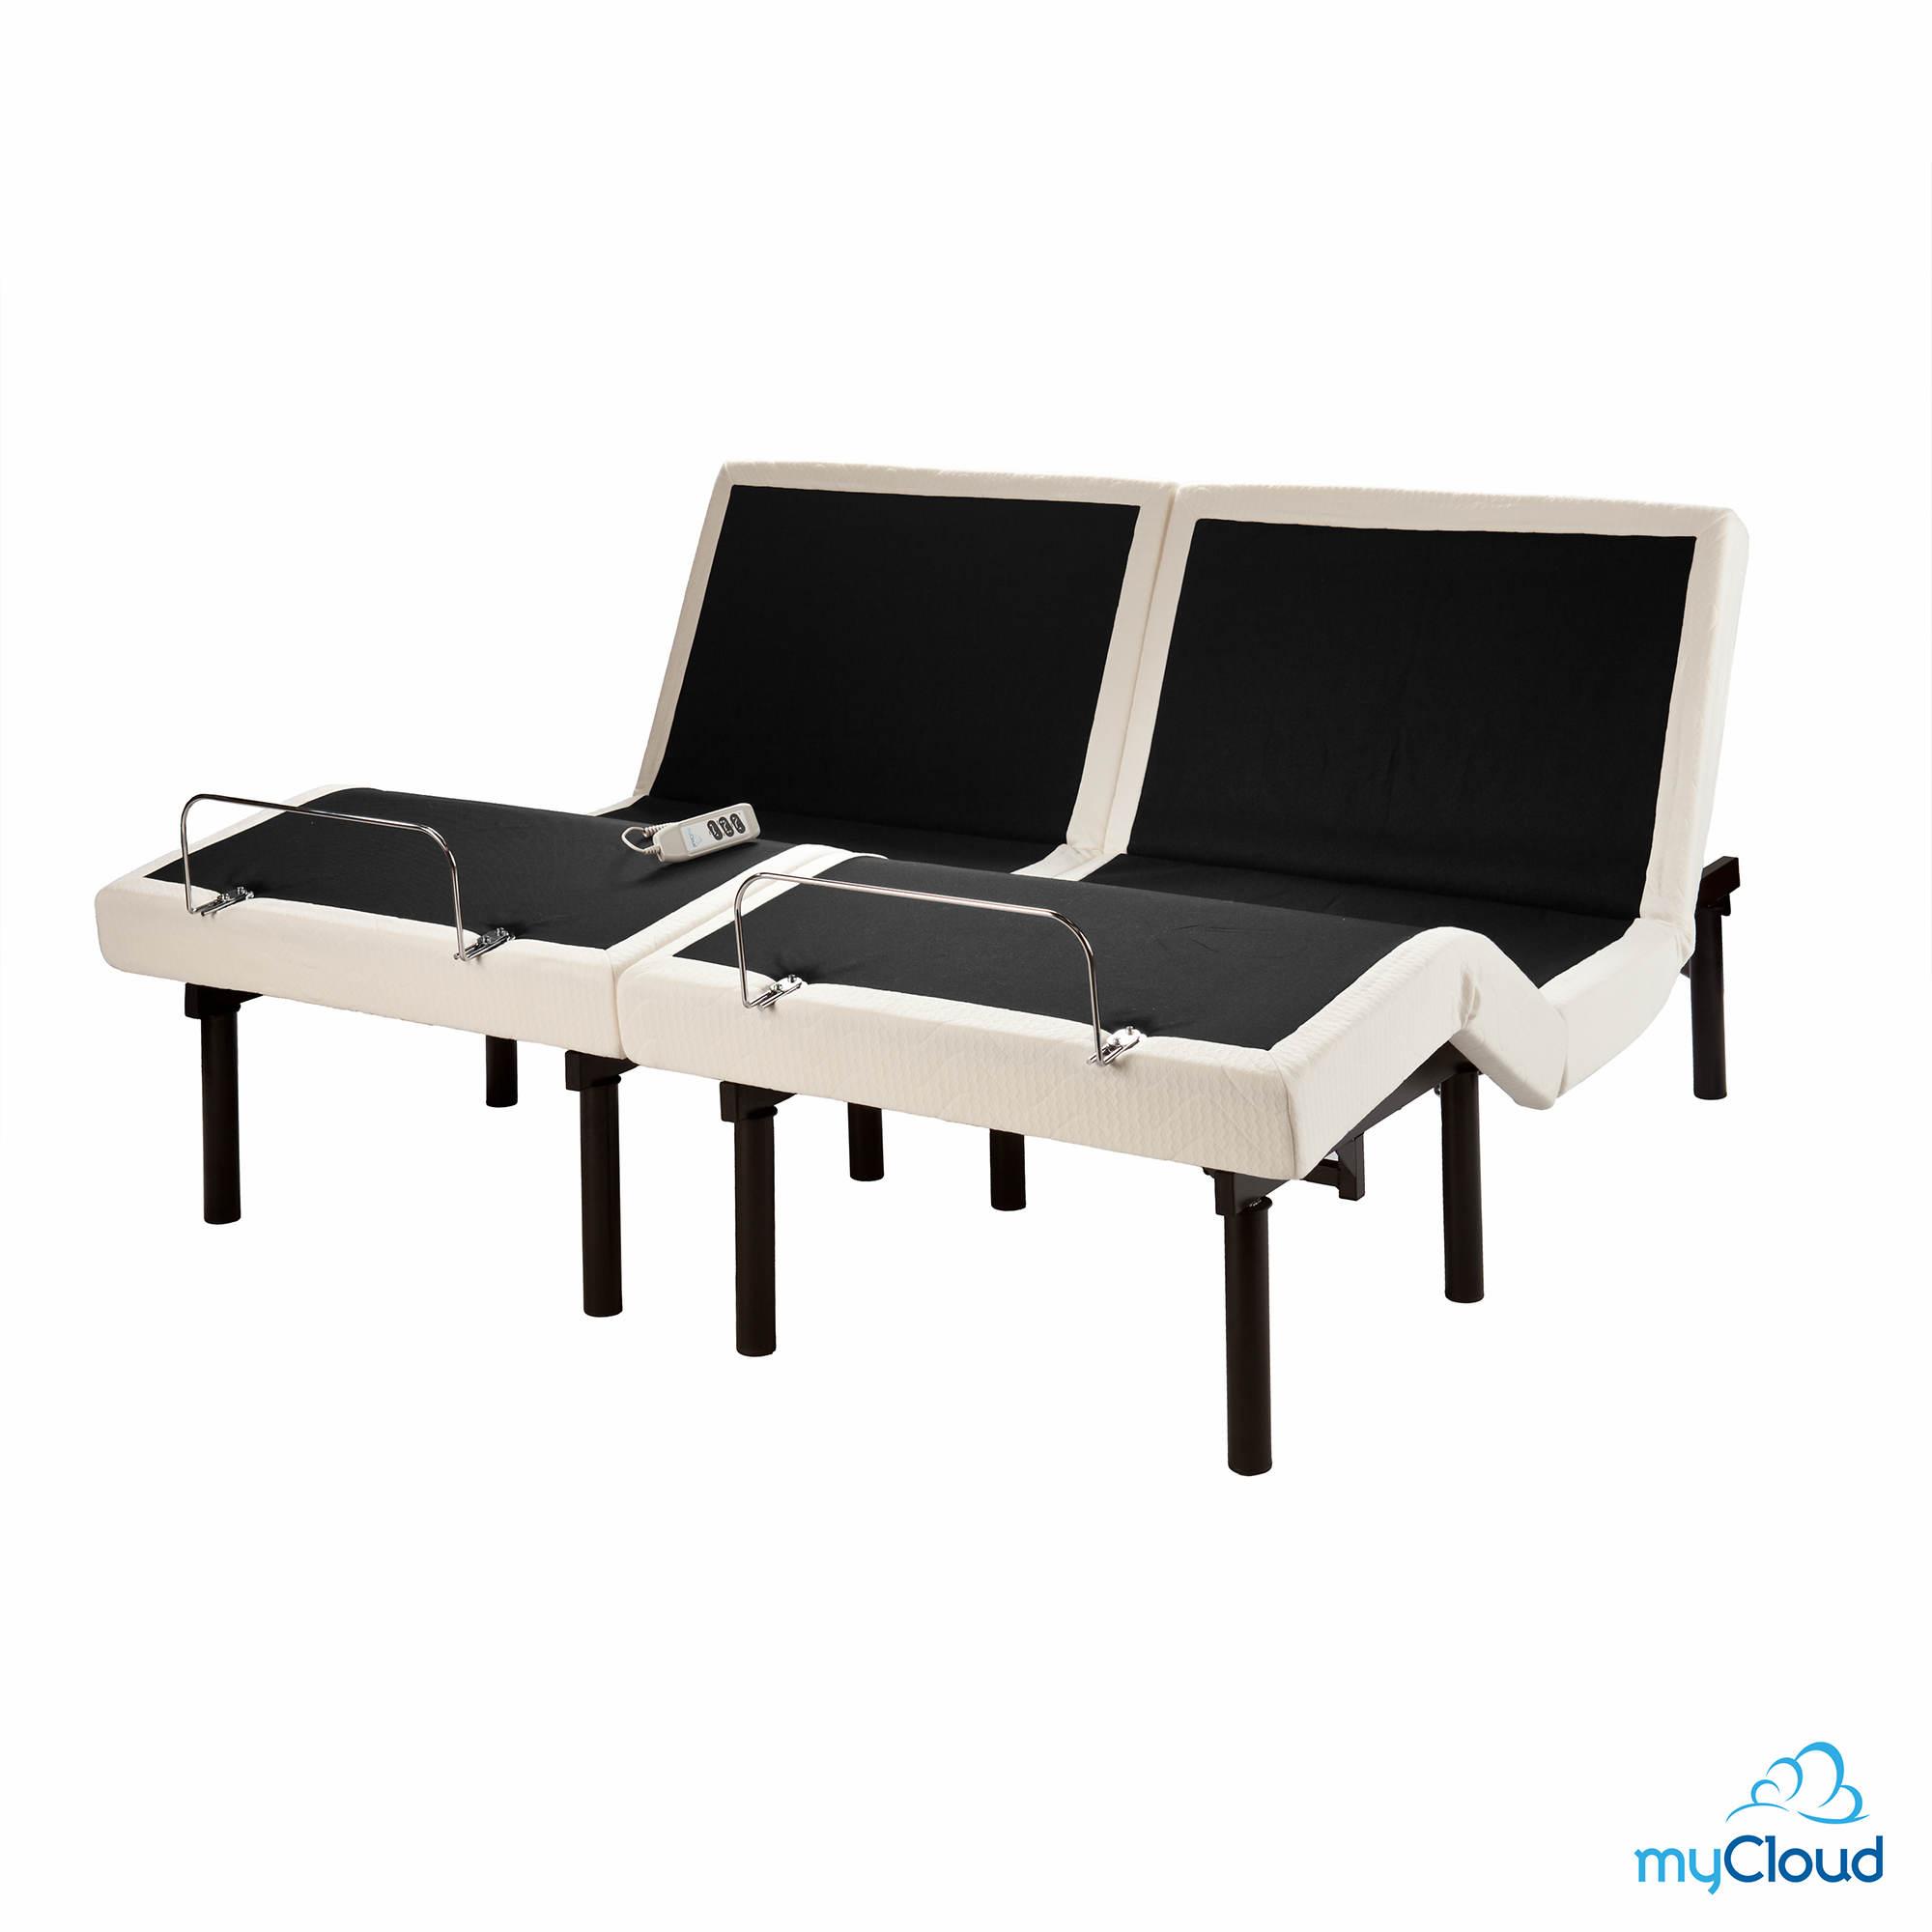 Sei Mycloud Split California King Size Adjustable Bed